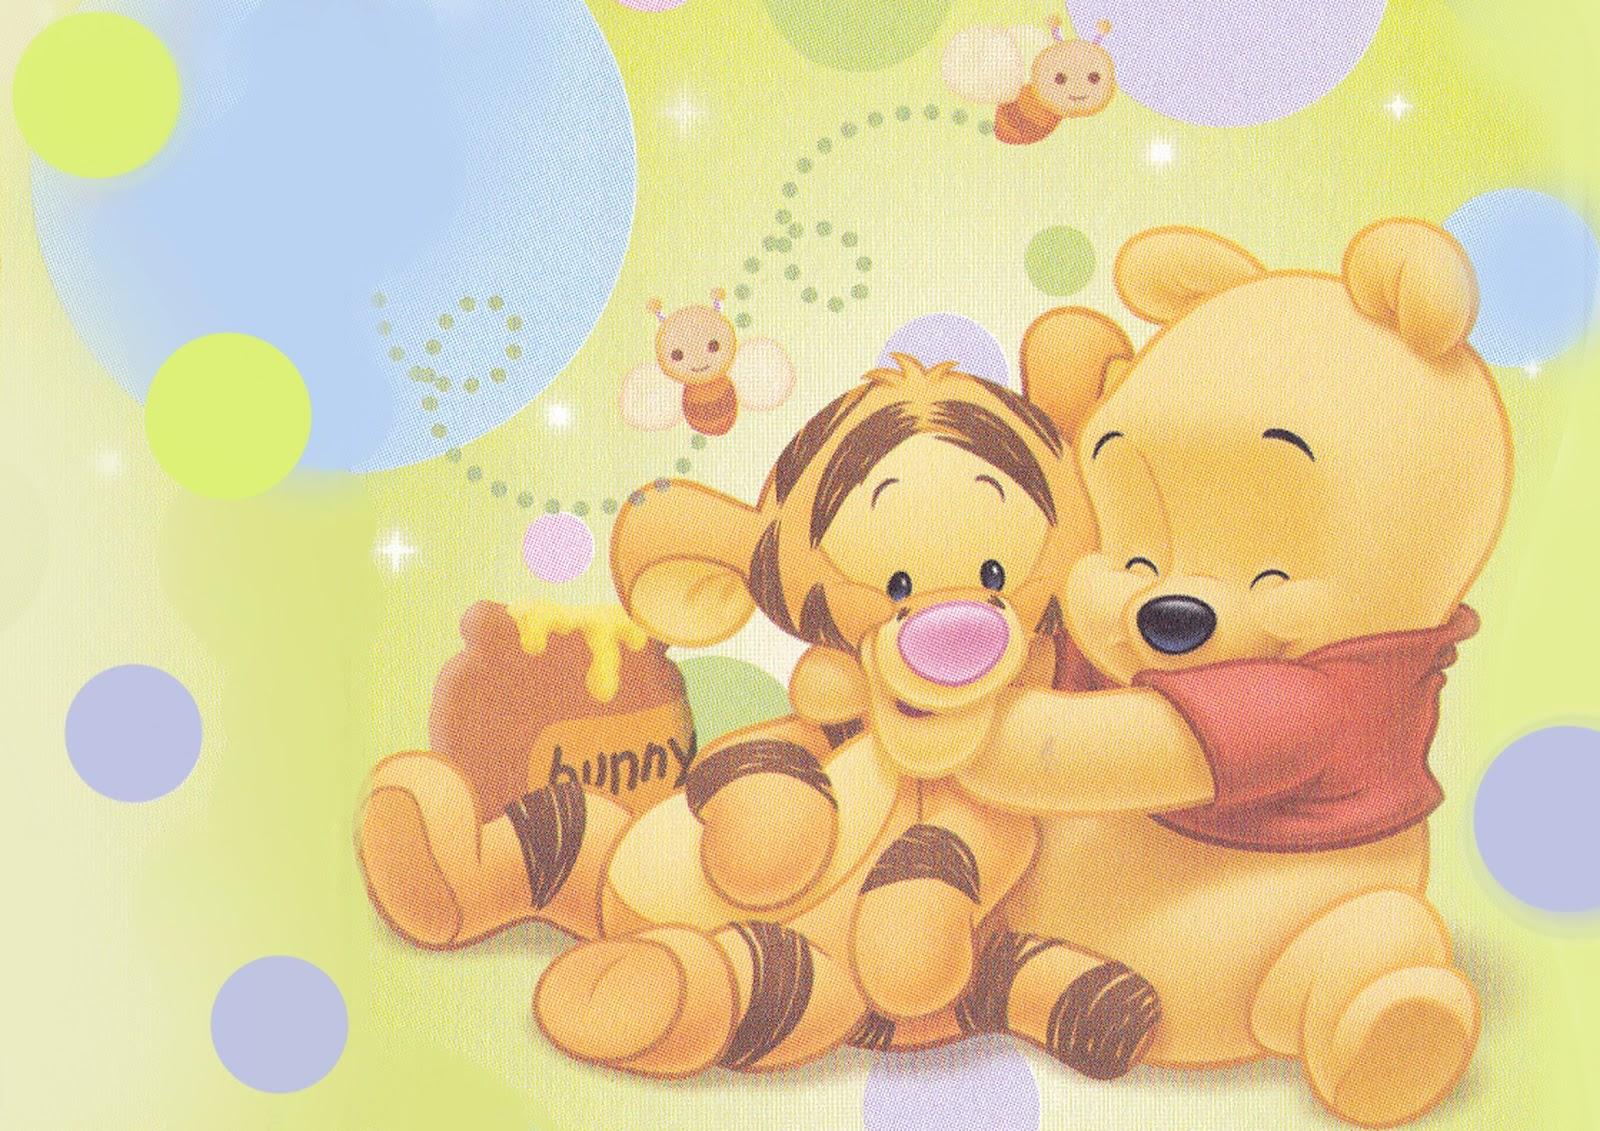 http://3.bp.blogspot.com/-Fgnswk4NyWk/T9FKbQcw48I/AAAAAAAAA2U/LS-rDwJazVw/s1600/Baby-pooh-wallpaper-baby-pooh-30438319-2339-1653.jpg